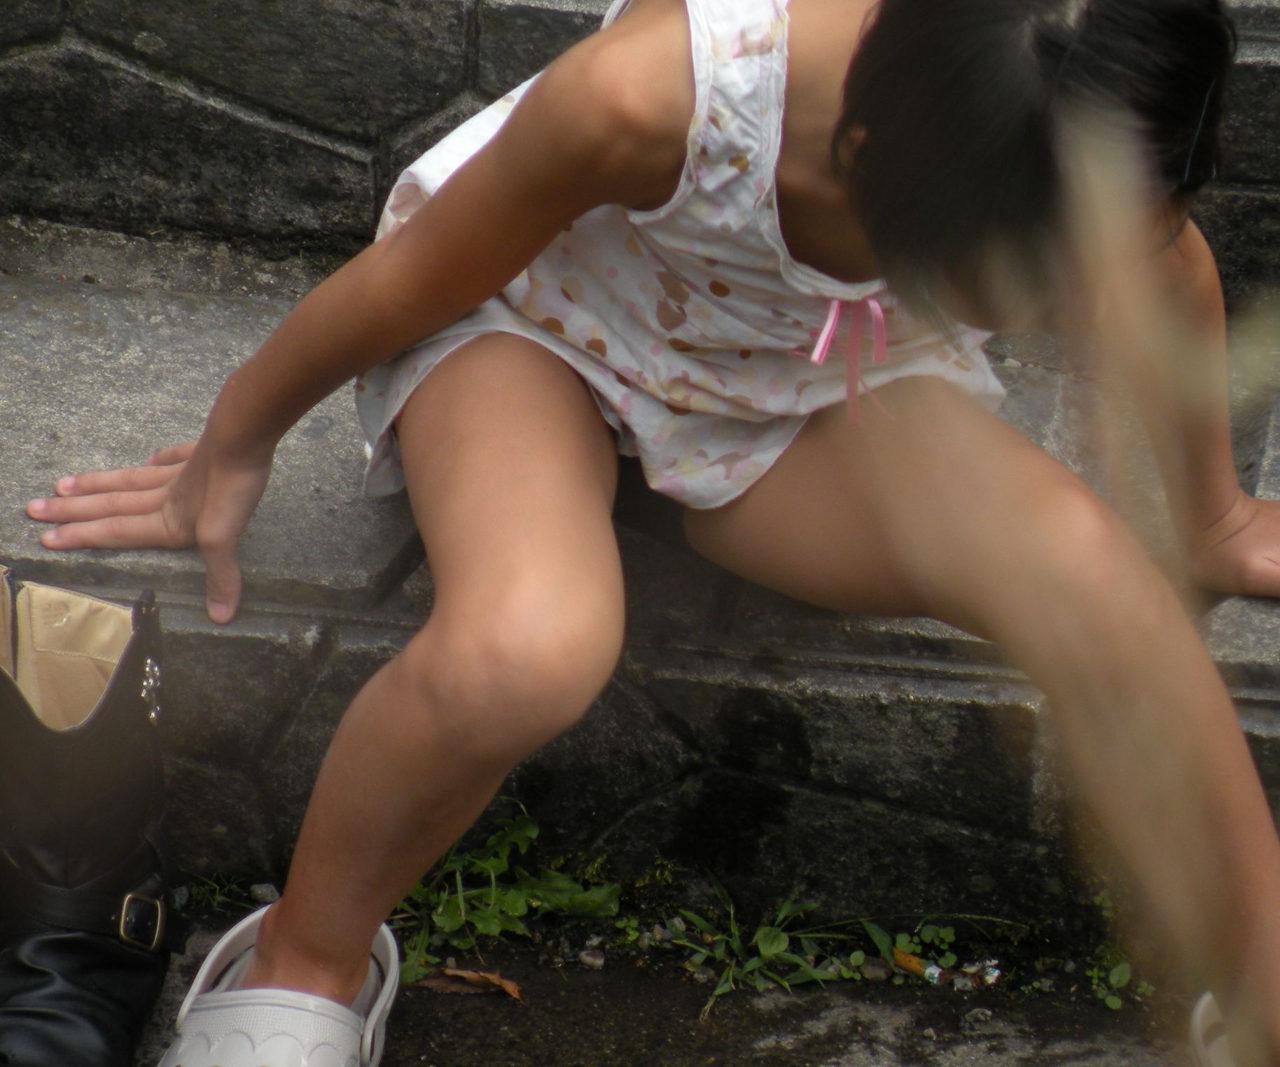 js jc 援交 【U15街撮り画像】イマドキのJCが大人過ぎてけしからん盗撮風の街撮り画像